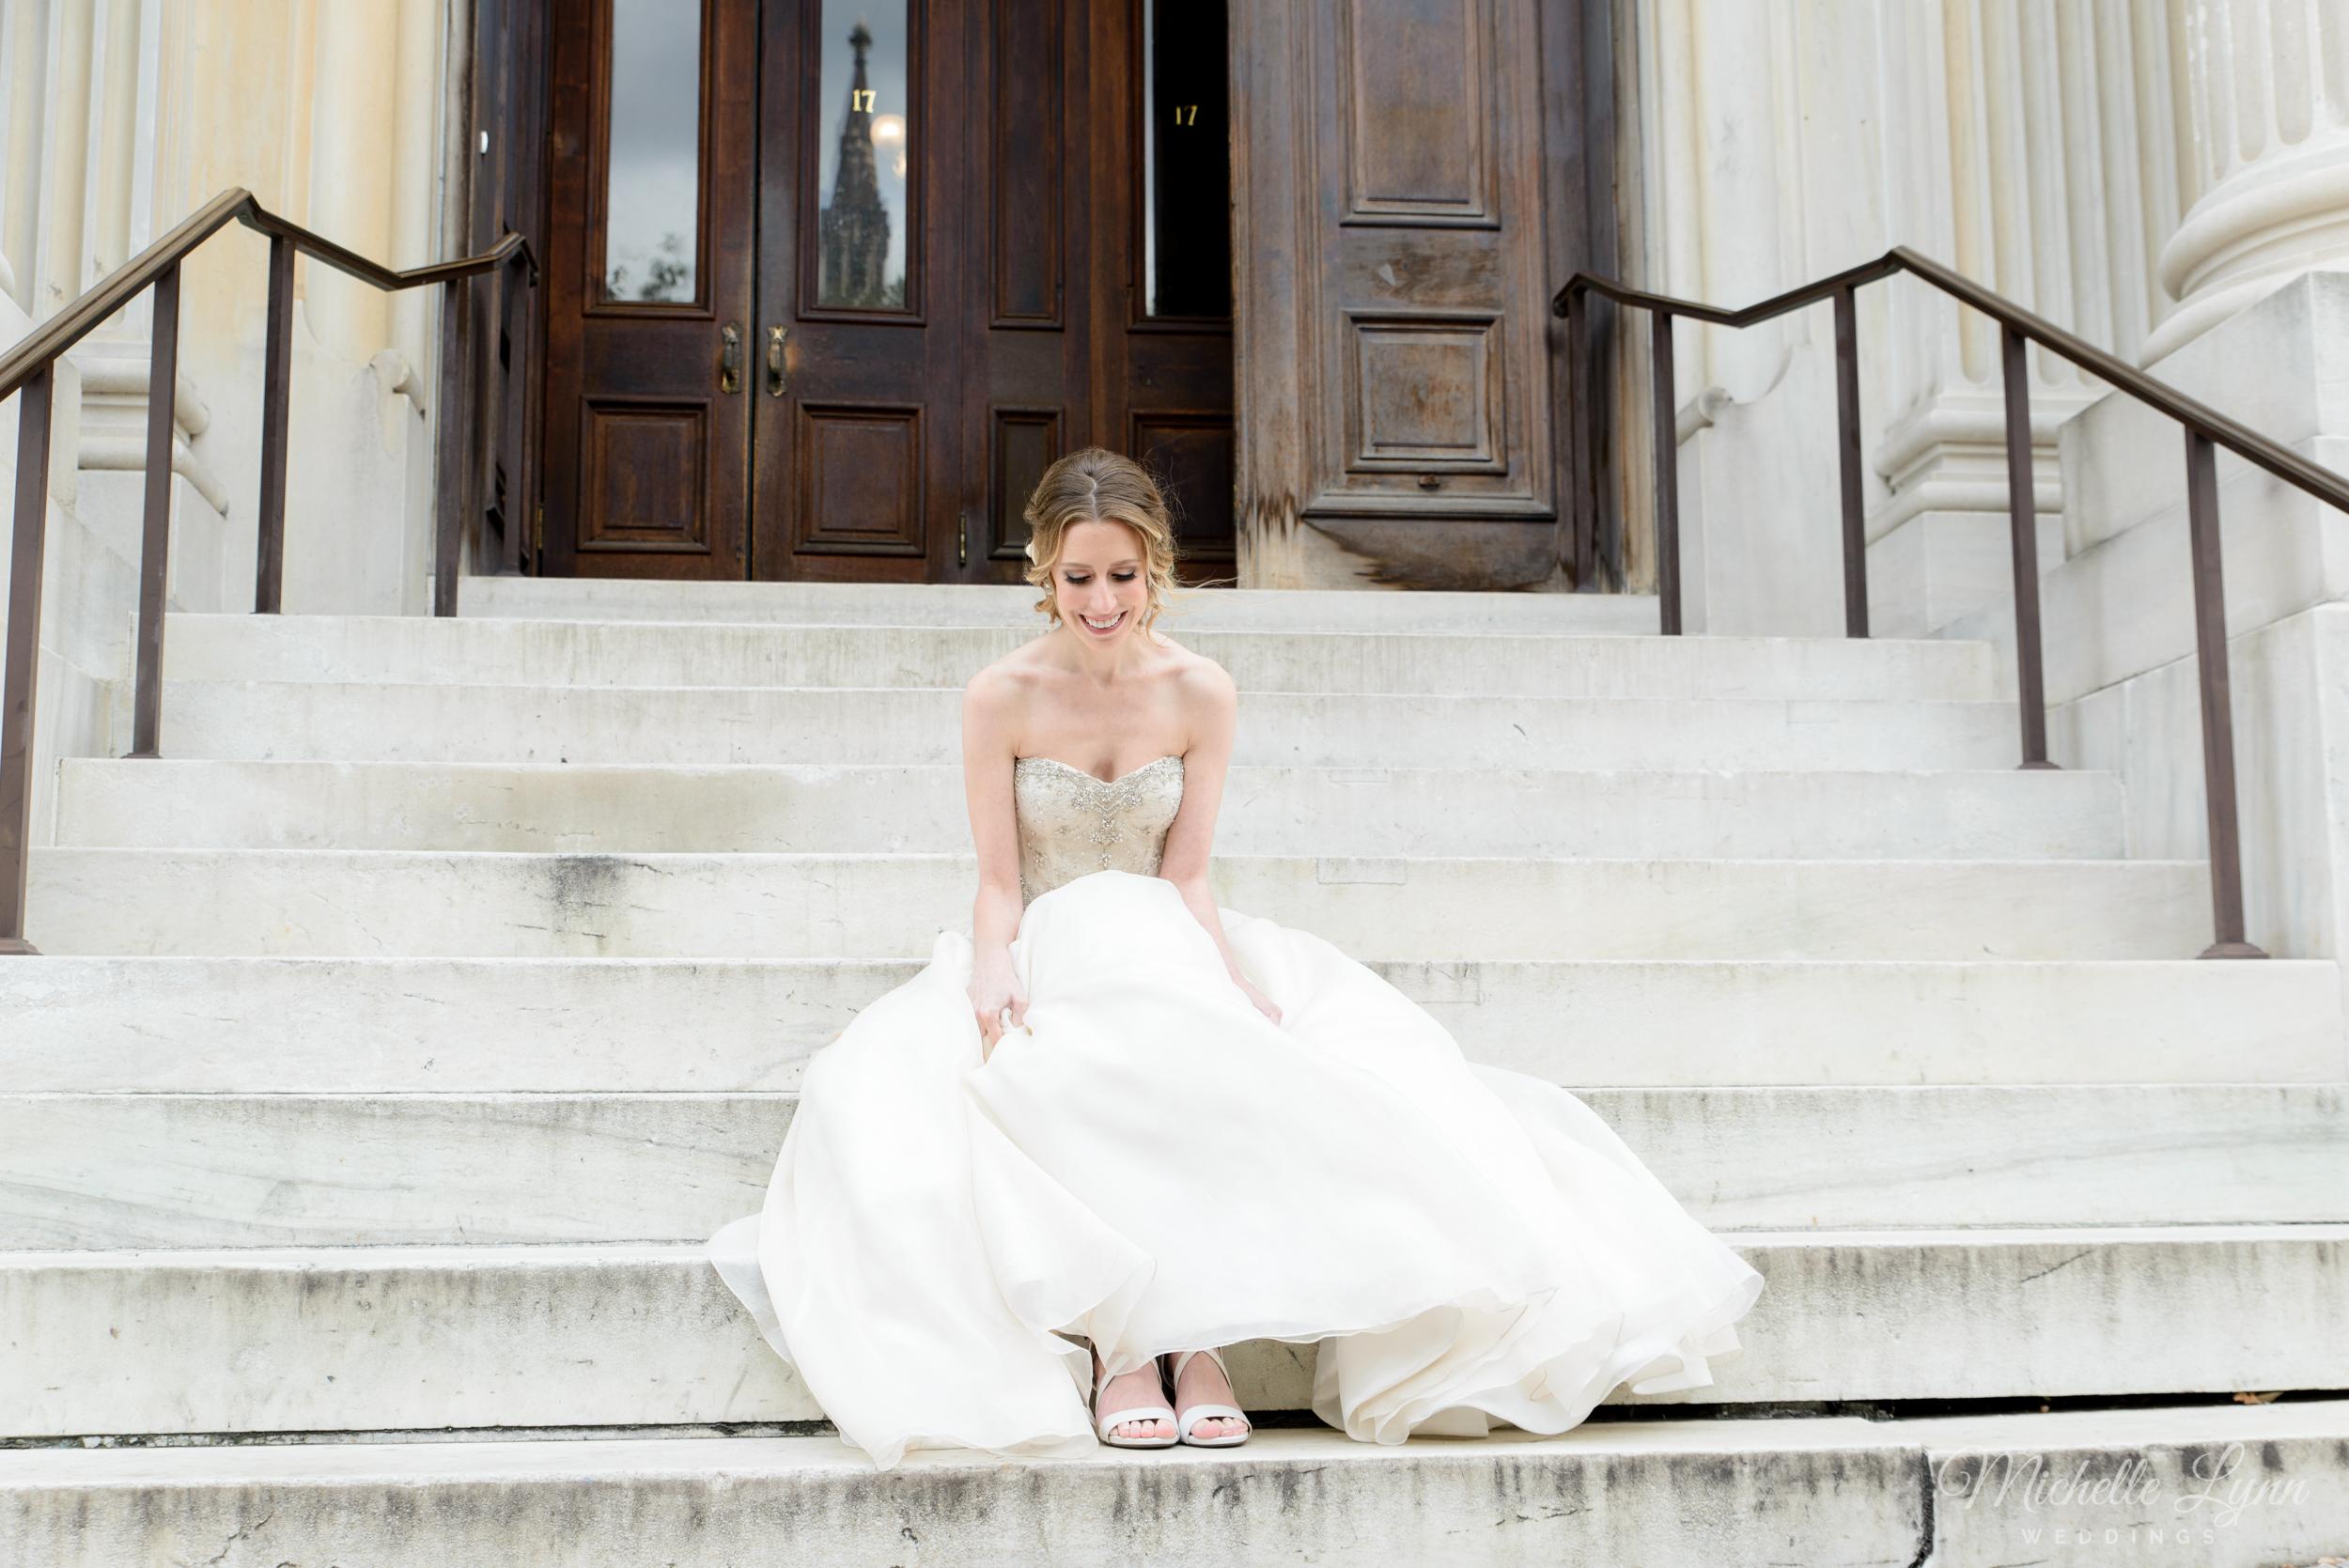 George_Peabody_Library-Wedding_Styled_Shoot-12.jpg